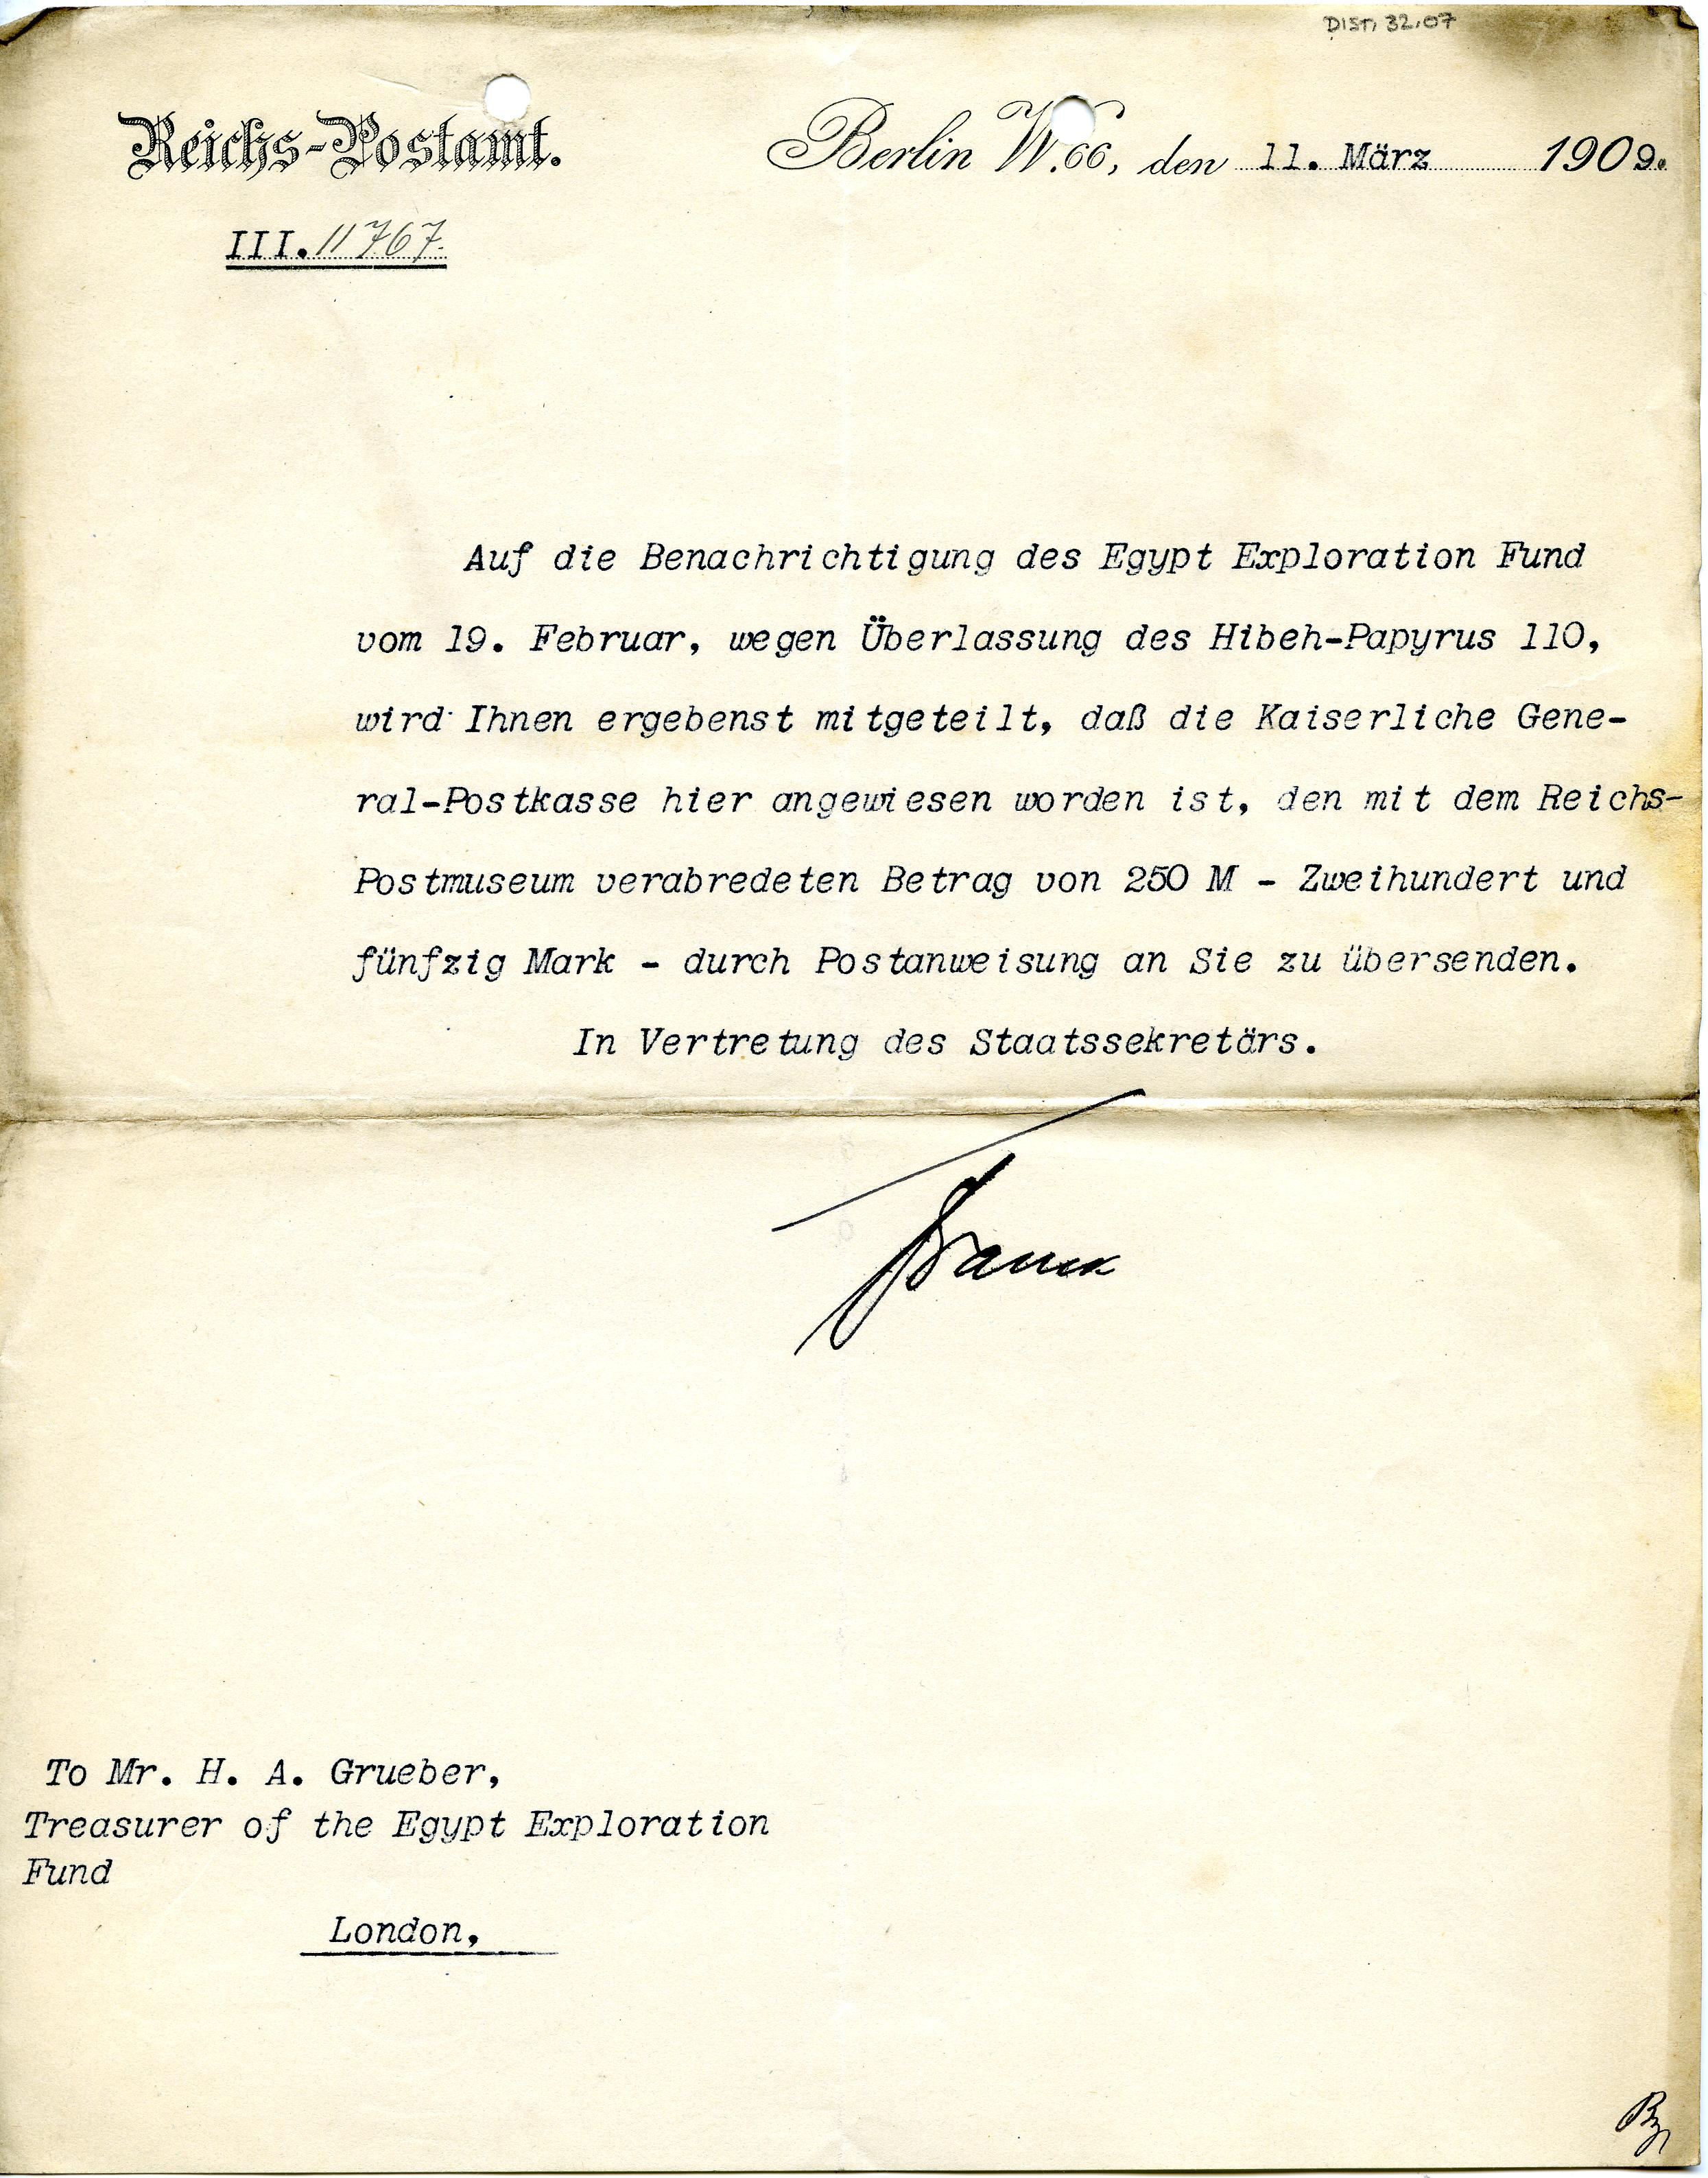 1908-13 Papyri DIST.32.07